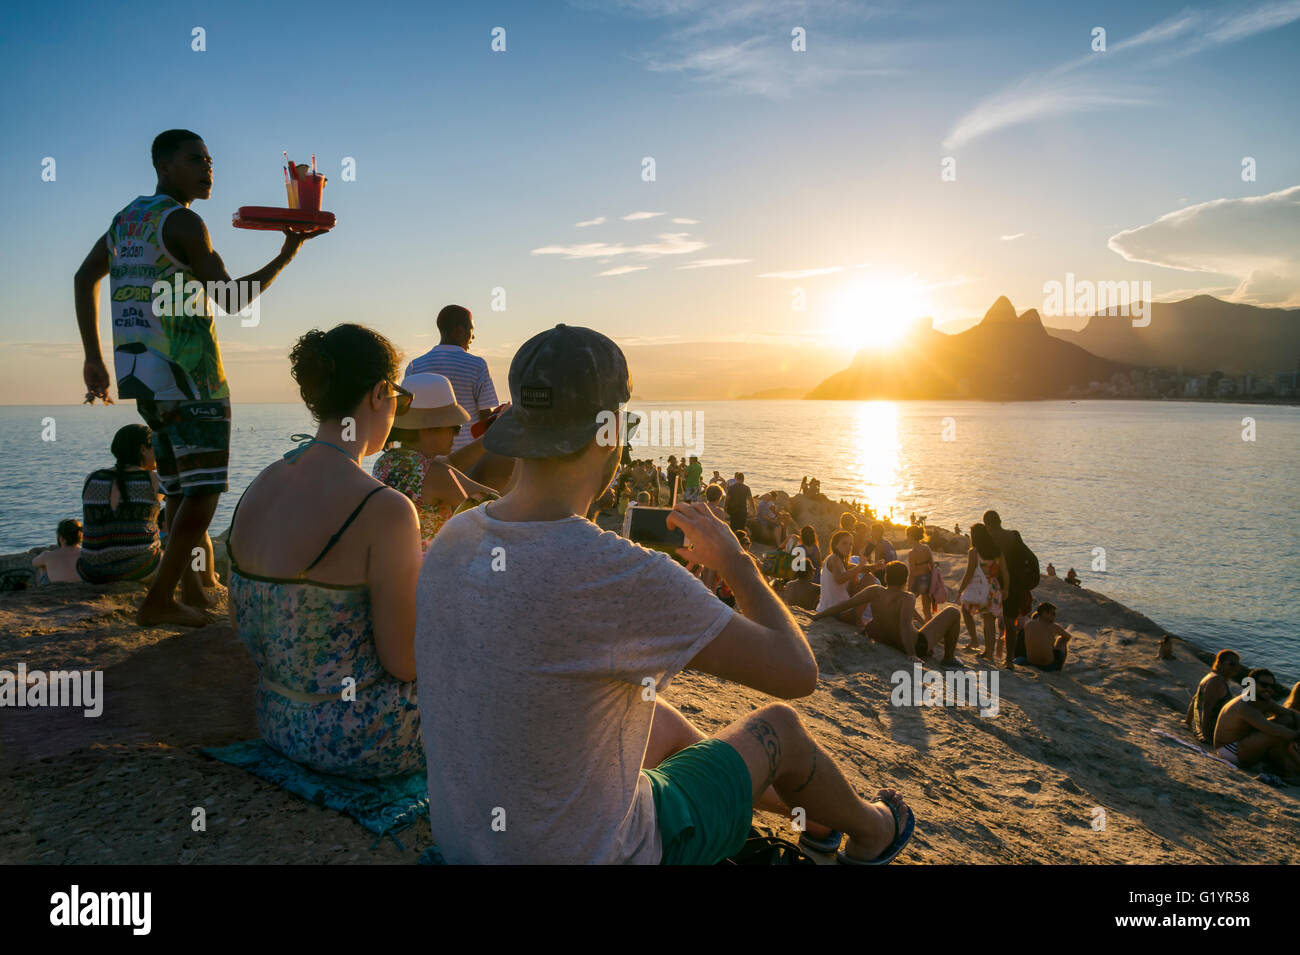 RIO DE JANEIRO - 26. Februar 2016: Massen von Menschen versammeln, um den Sonnenuntergang auf den Felsen am Arpoador Stockbild